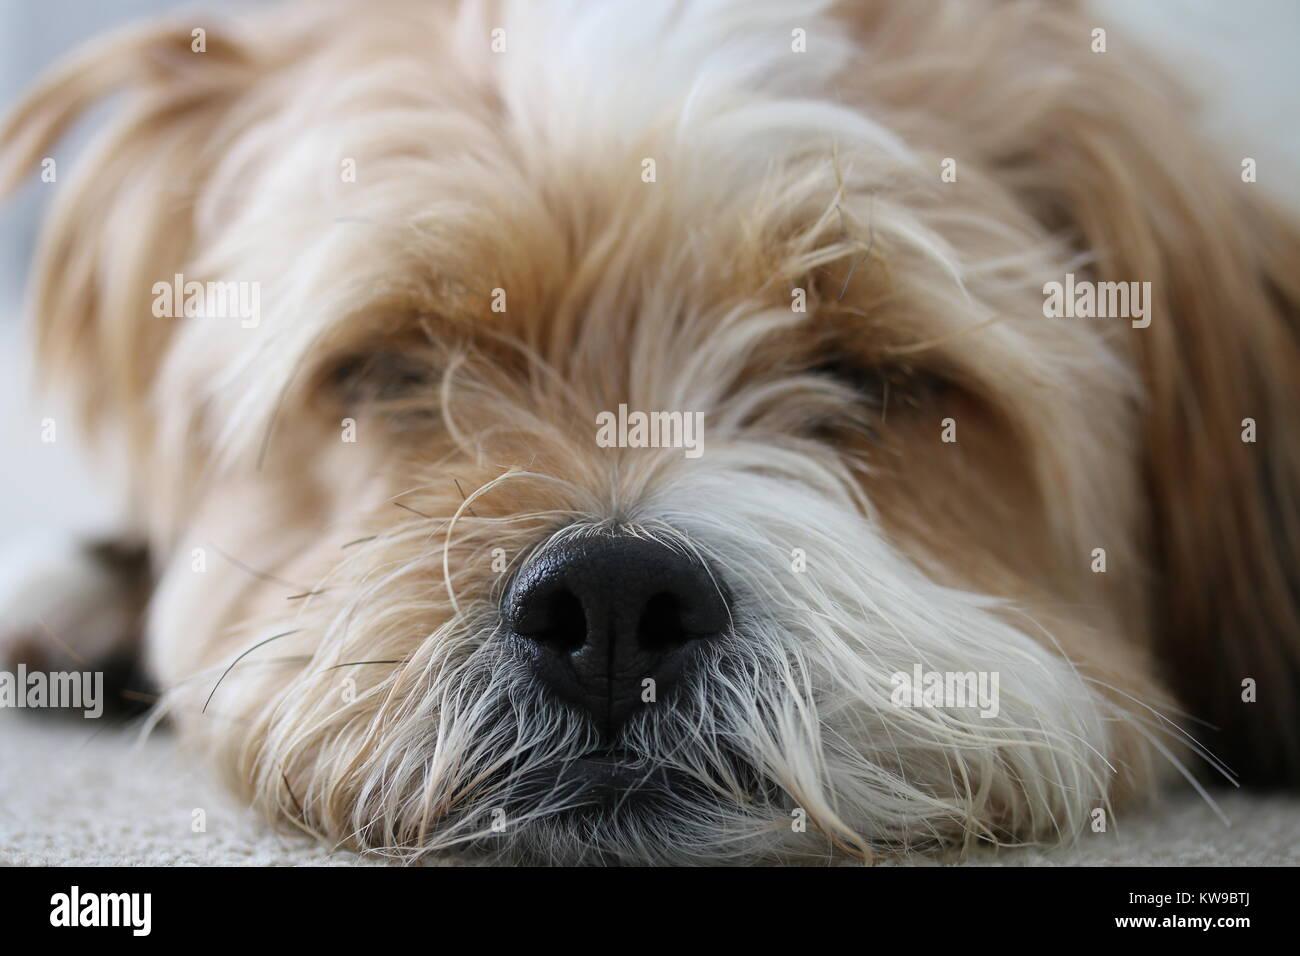 Close up of Dogs Head sleeping - Stock Image